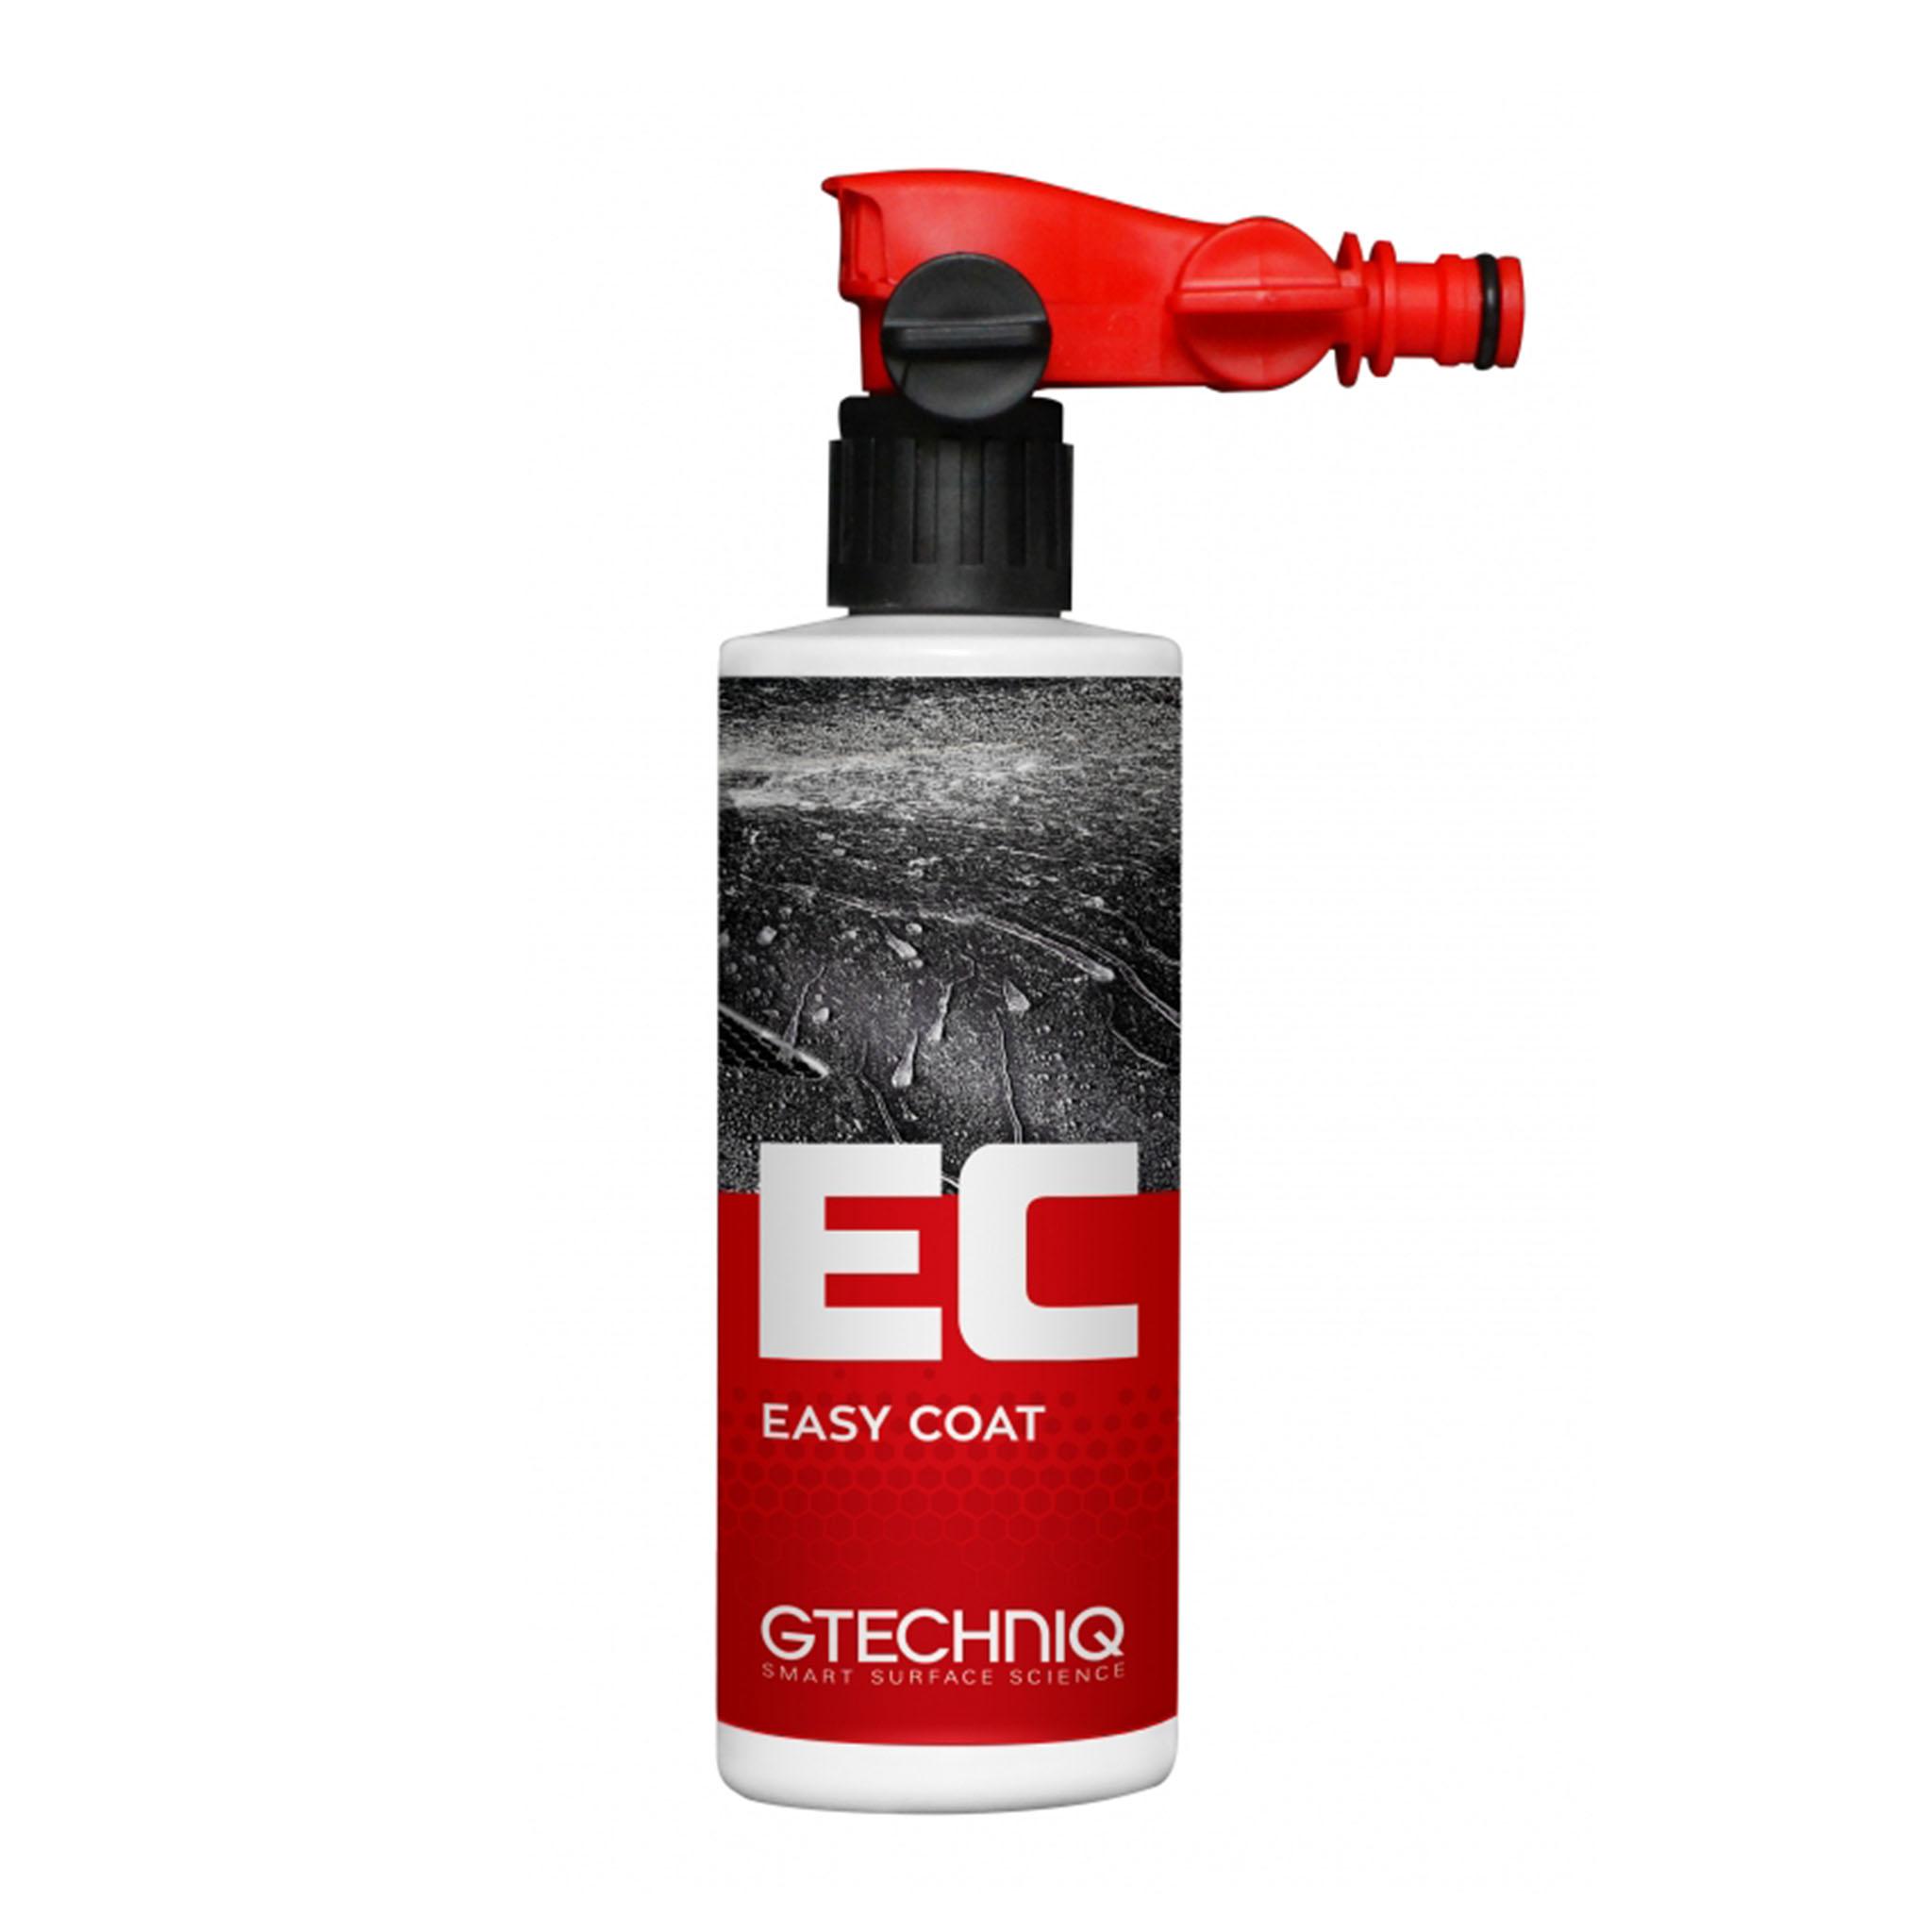 Snabbförsegling Gtechniq Easy Coat, 1 st 500 ml + 1 st sprutmunstycke